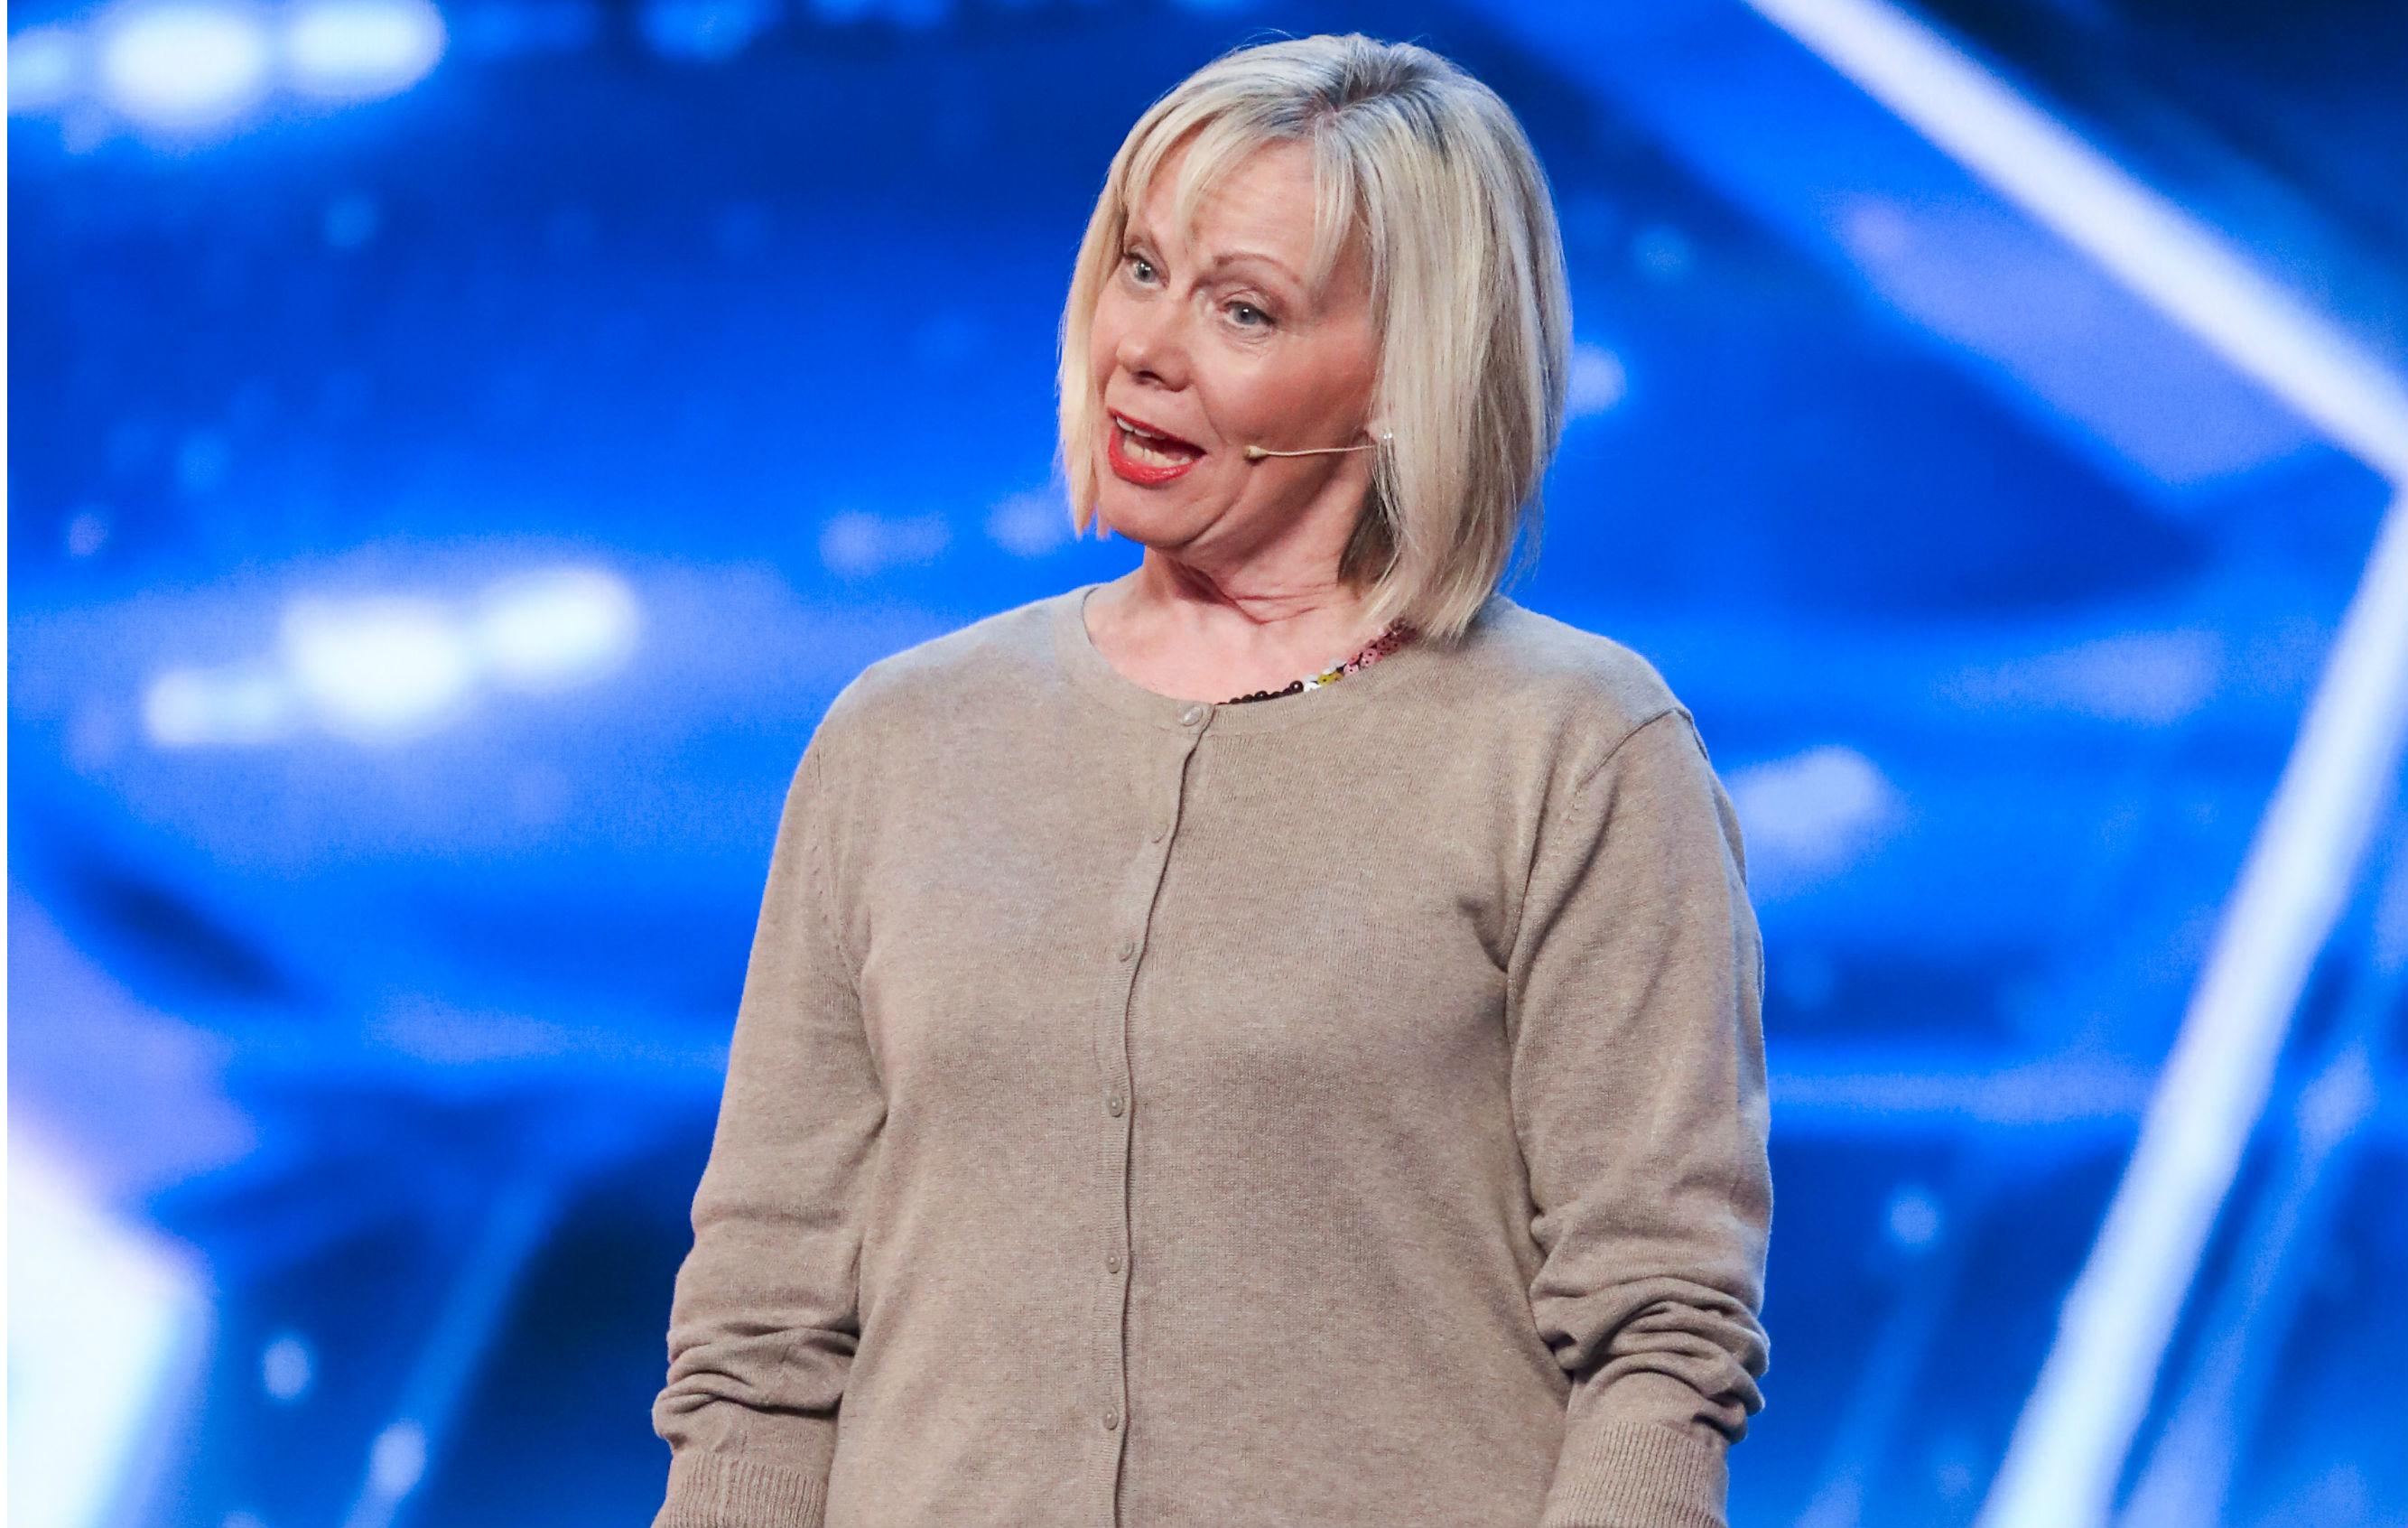 Britain's Got Talent, Christine